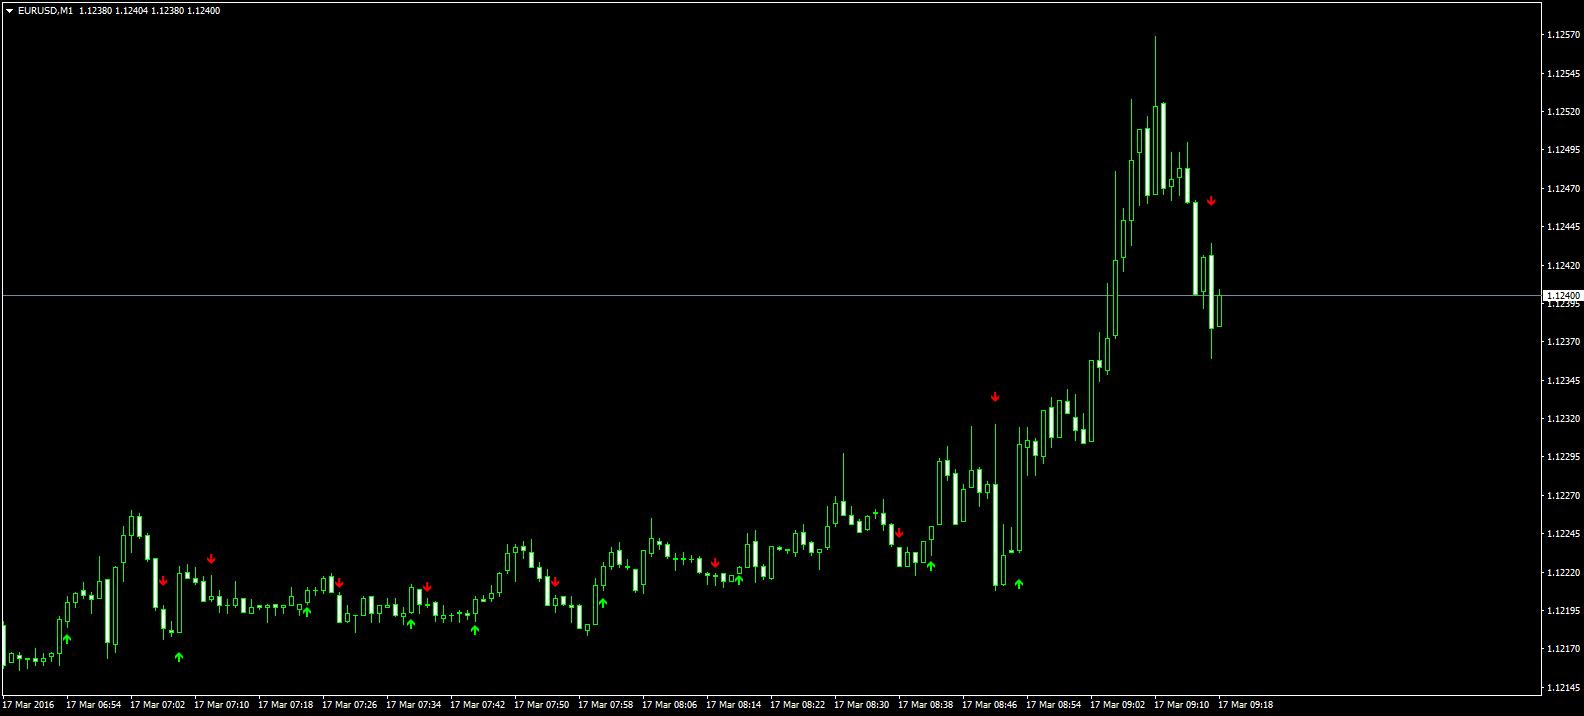 Plat Trend Strategia comercială Opțiuni binare | hegymaszas.ro